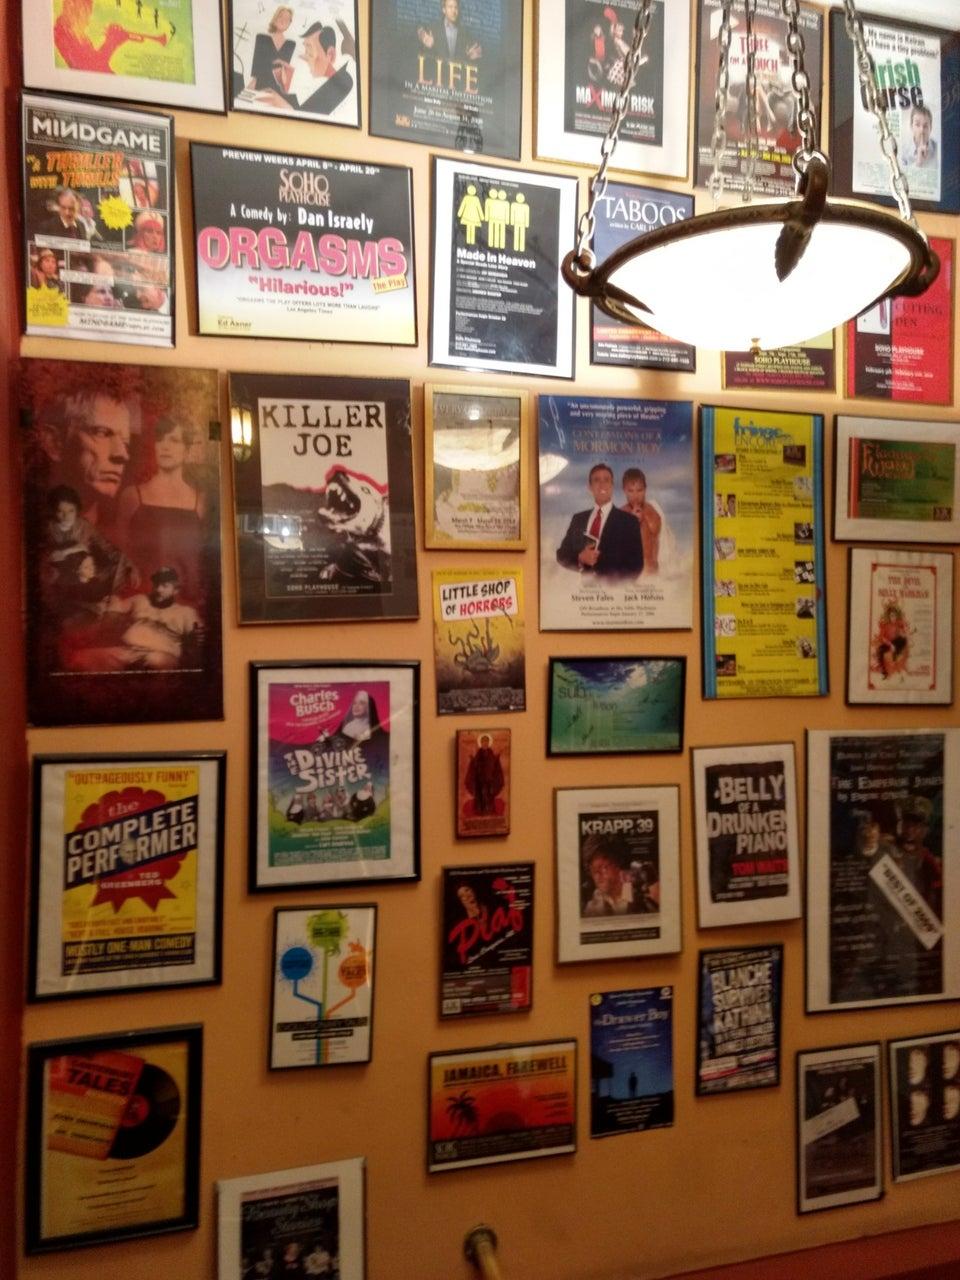 Soho Playhouse Photos   GayCities New York